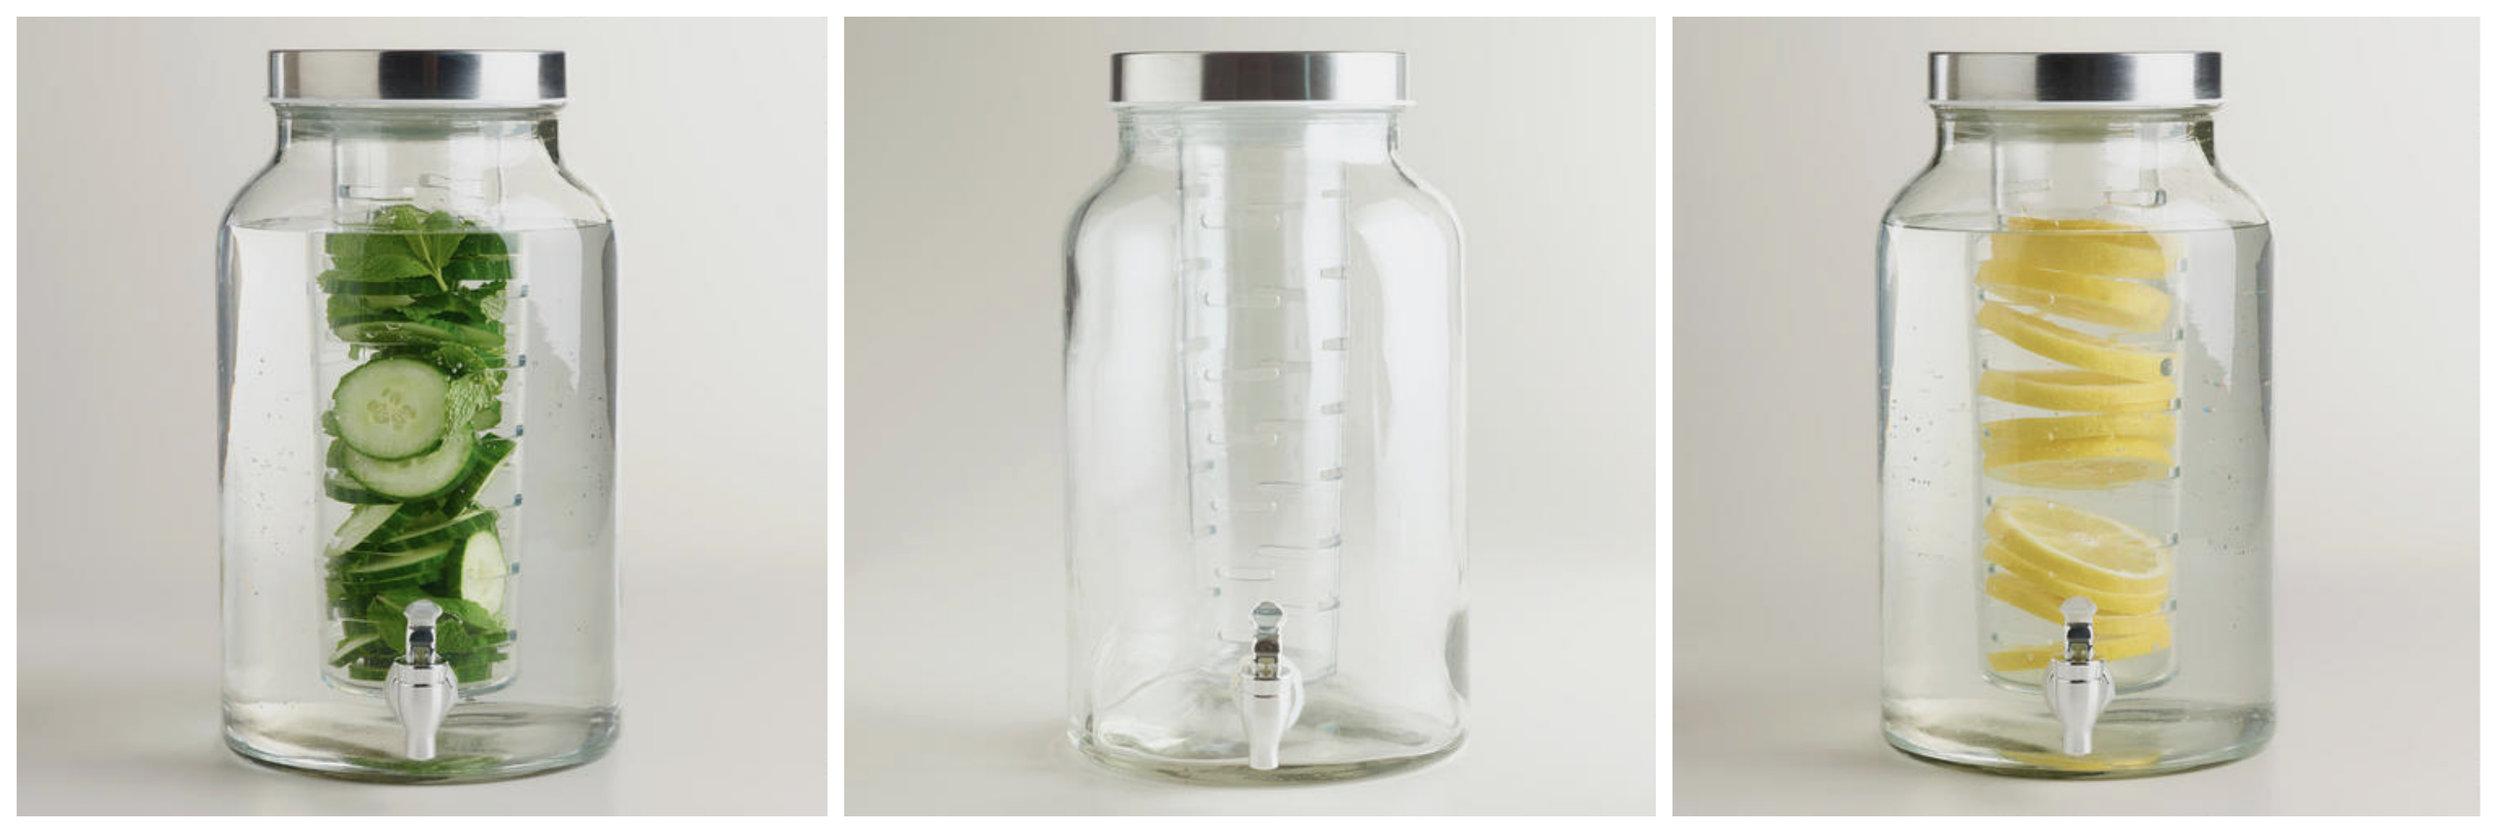 WM Glass Infuser Dispenser